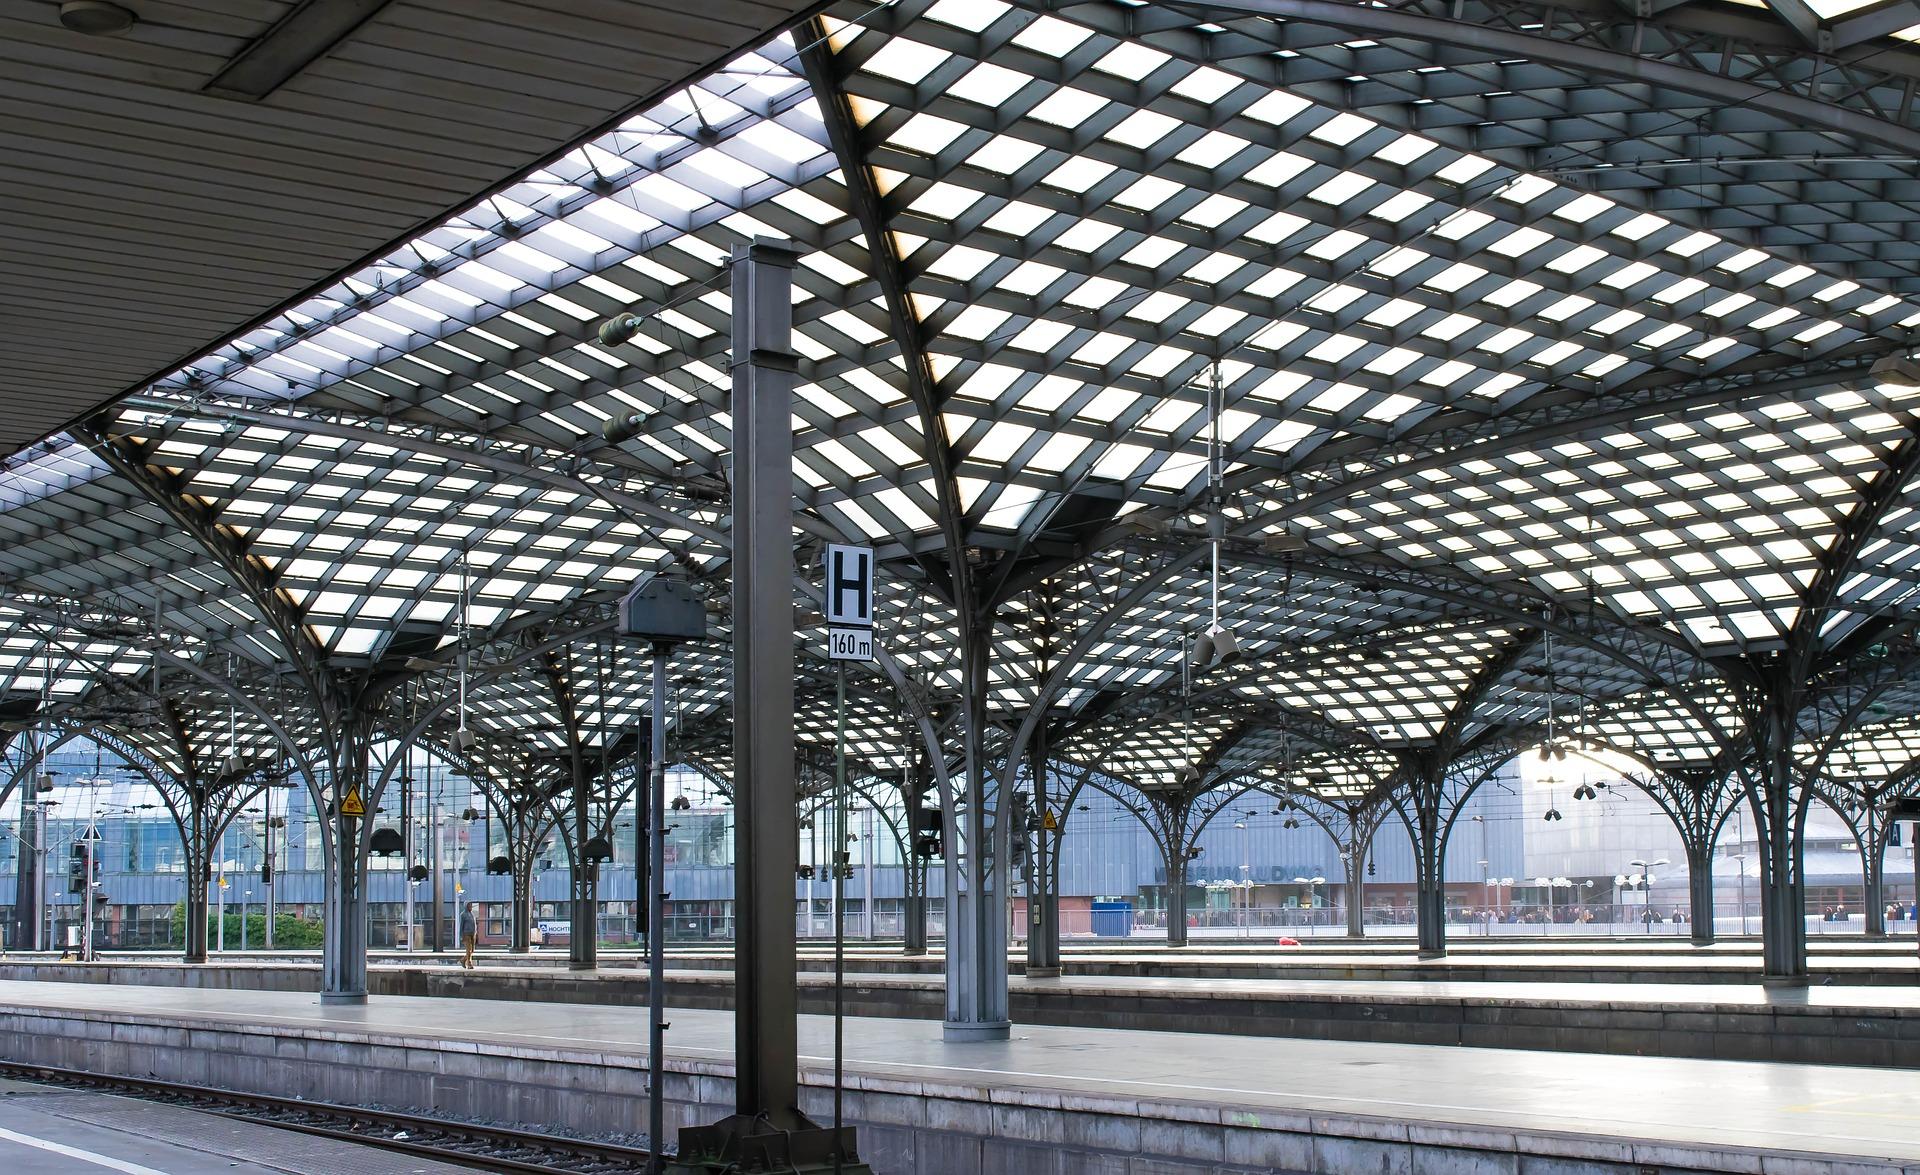 Railway Station, Metal, Rail, Railway, Service, HQ Photo